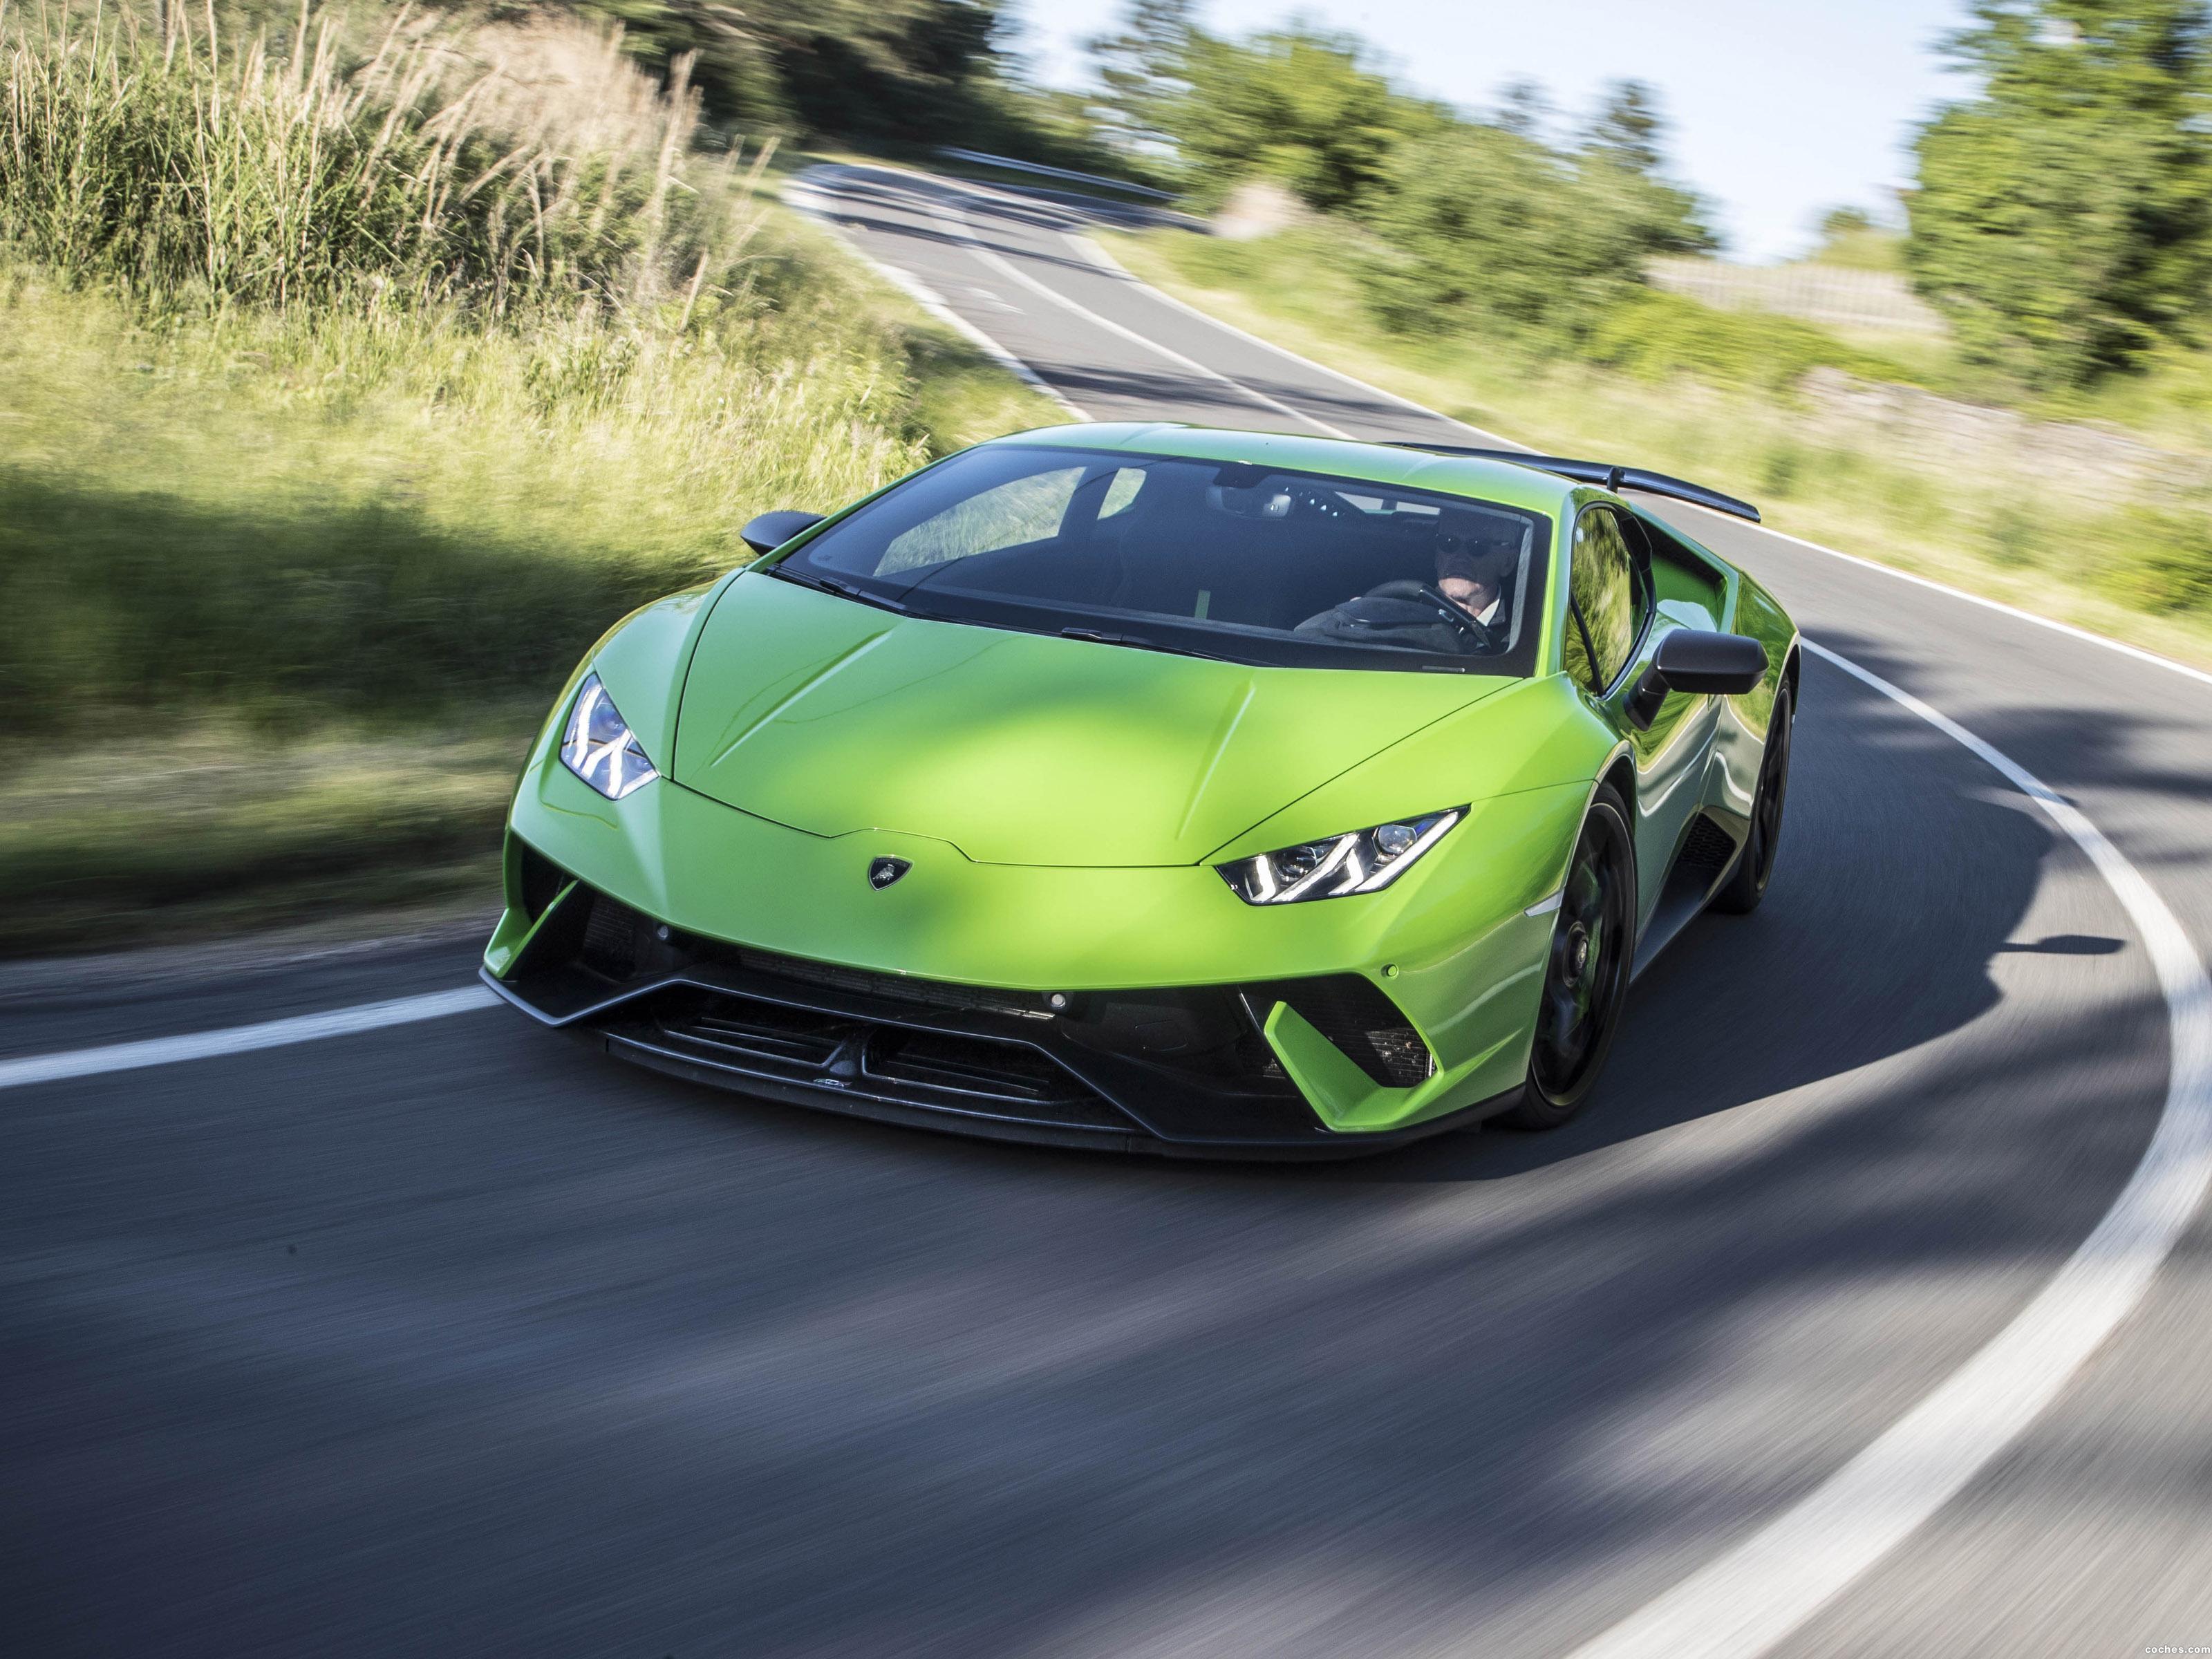 Foto 0 de Lamborghini Huracan Performante LB724 2017